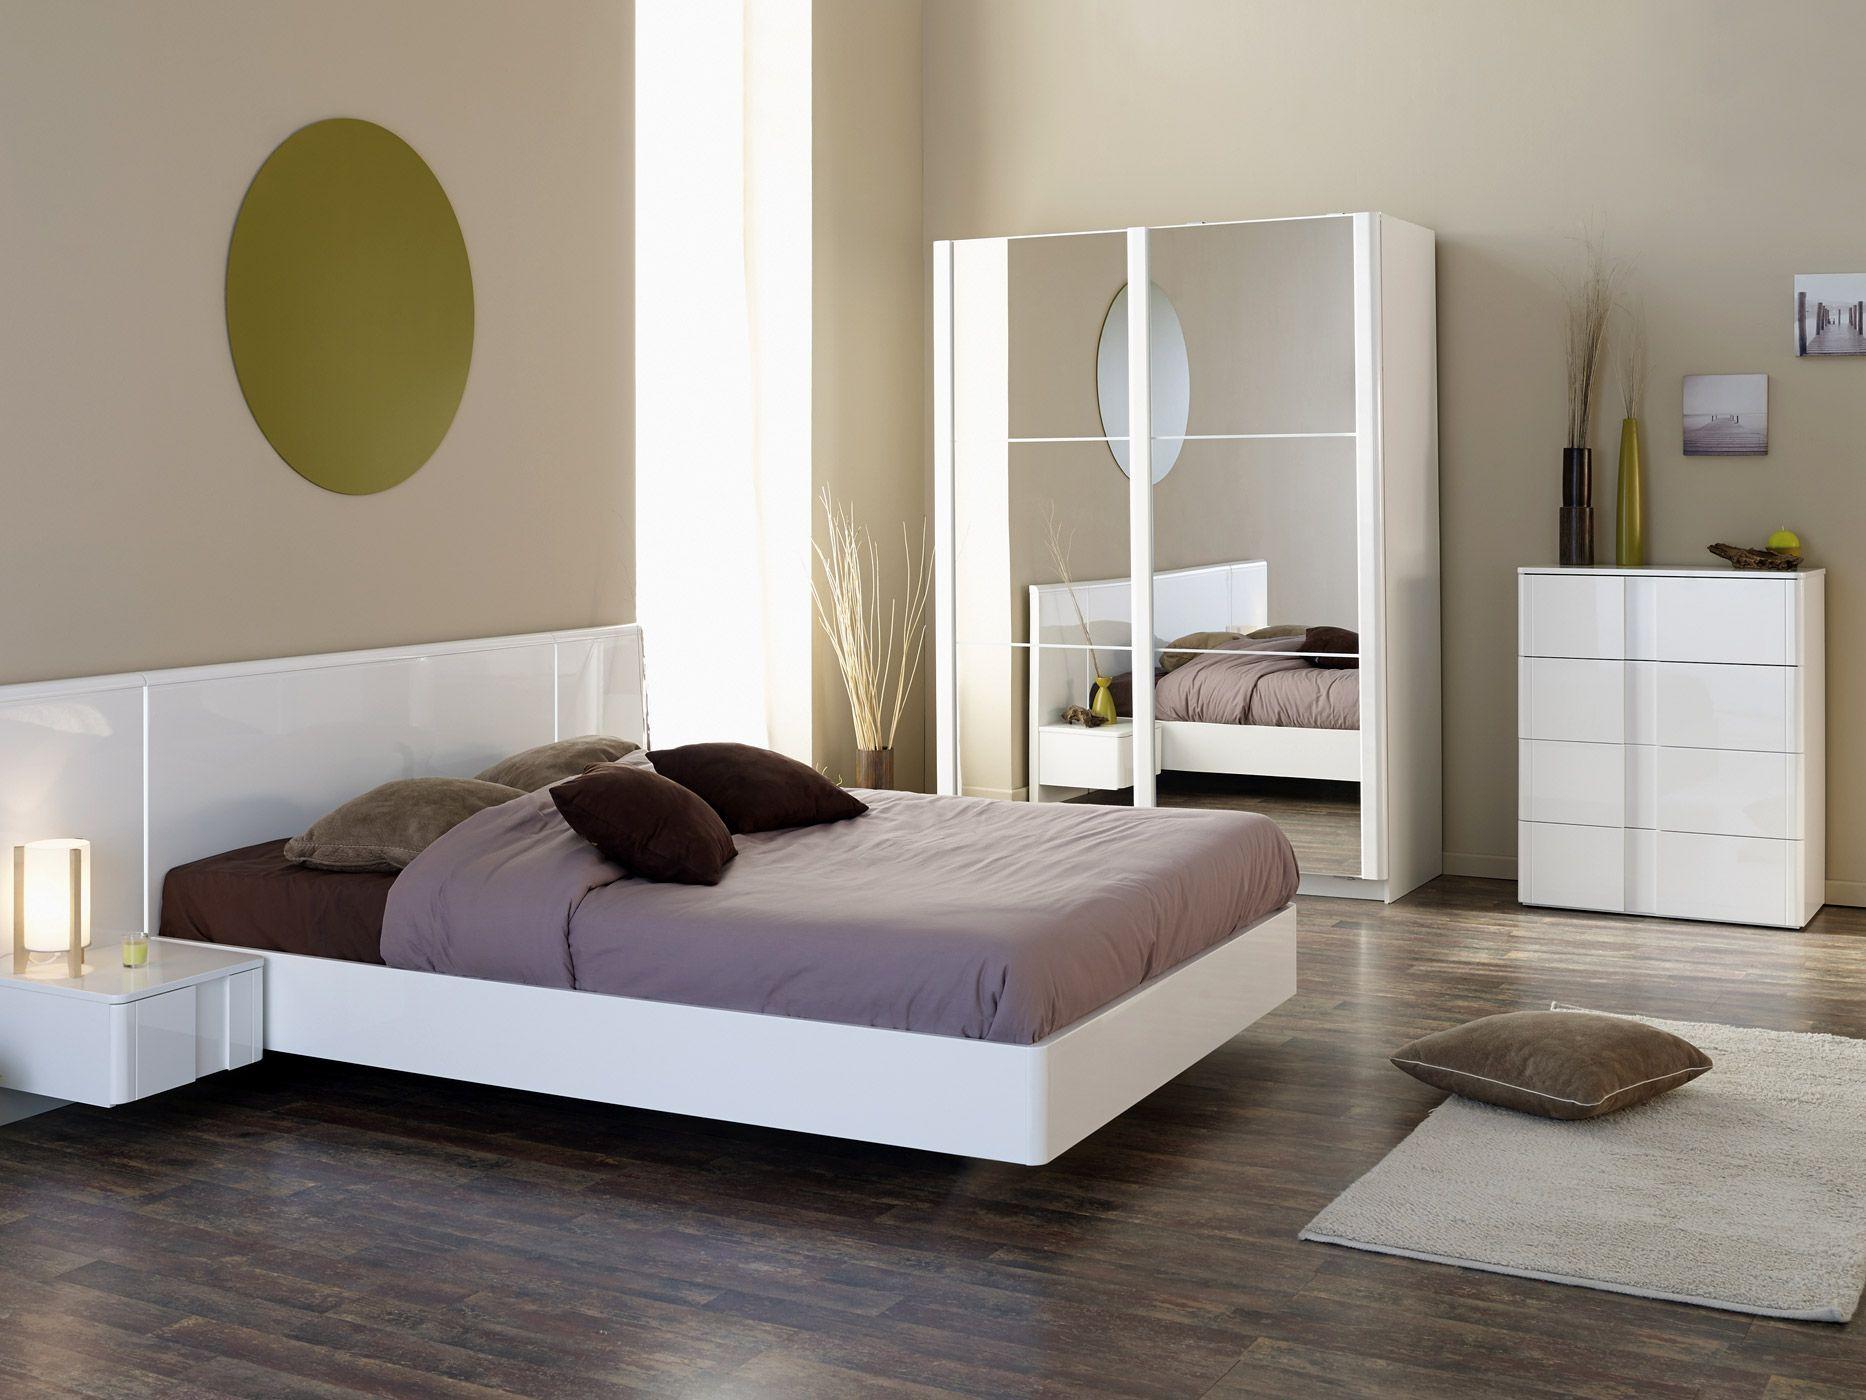 Wit en modern gaan hand in hand uige slaapkamer Wesley bestaande